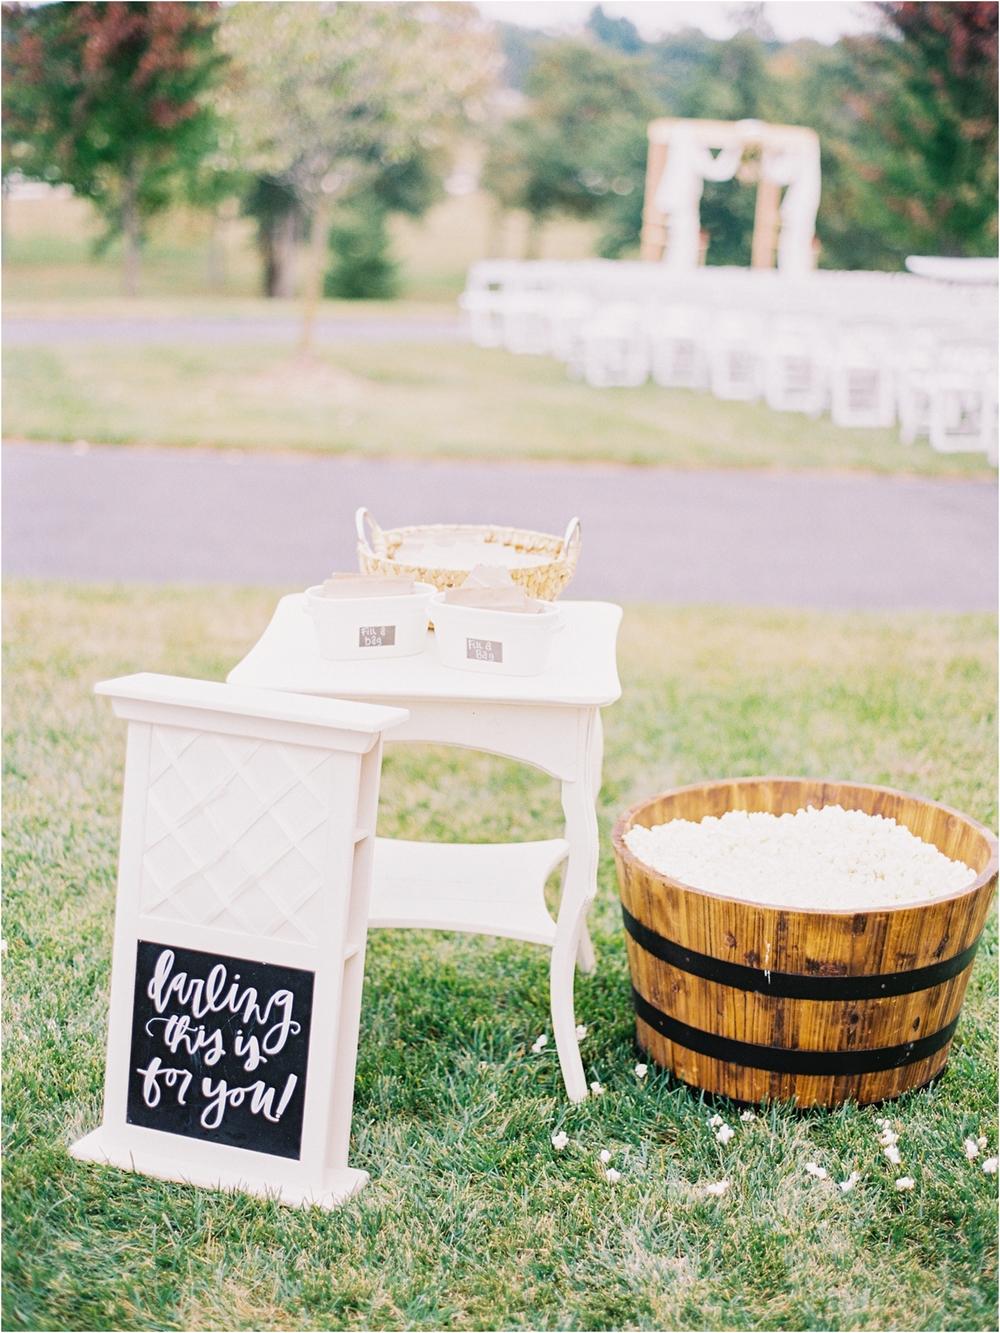 Springfield MO Wedding Ideas - Jordan Brittley Photography (www.jordanbrittley.com) // Serve Popcorn at your wedding!